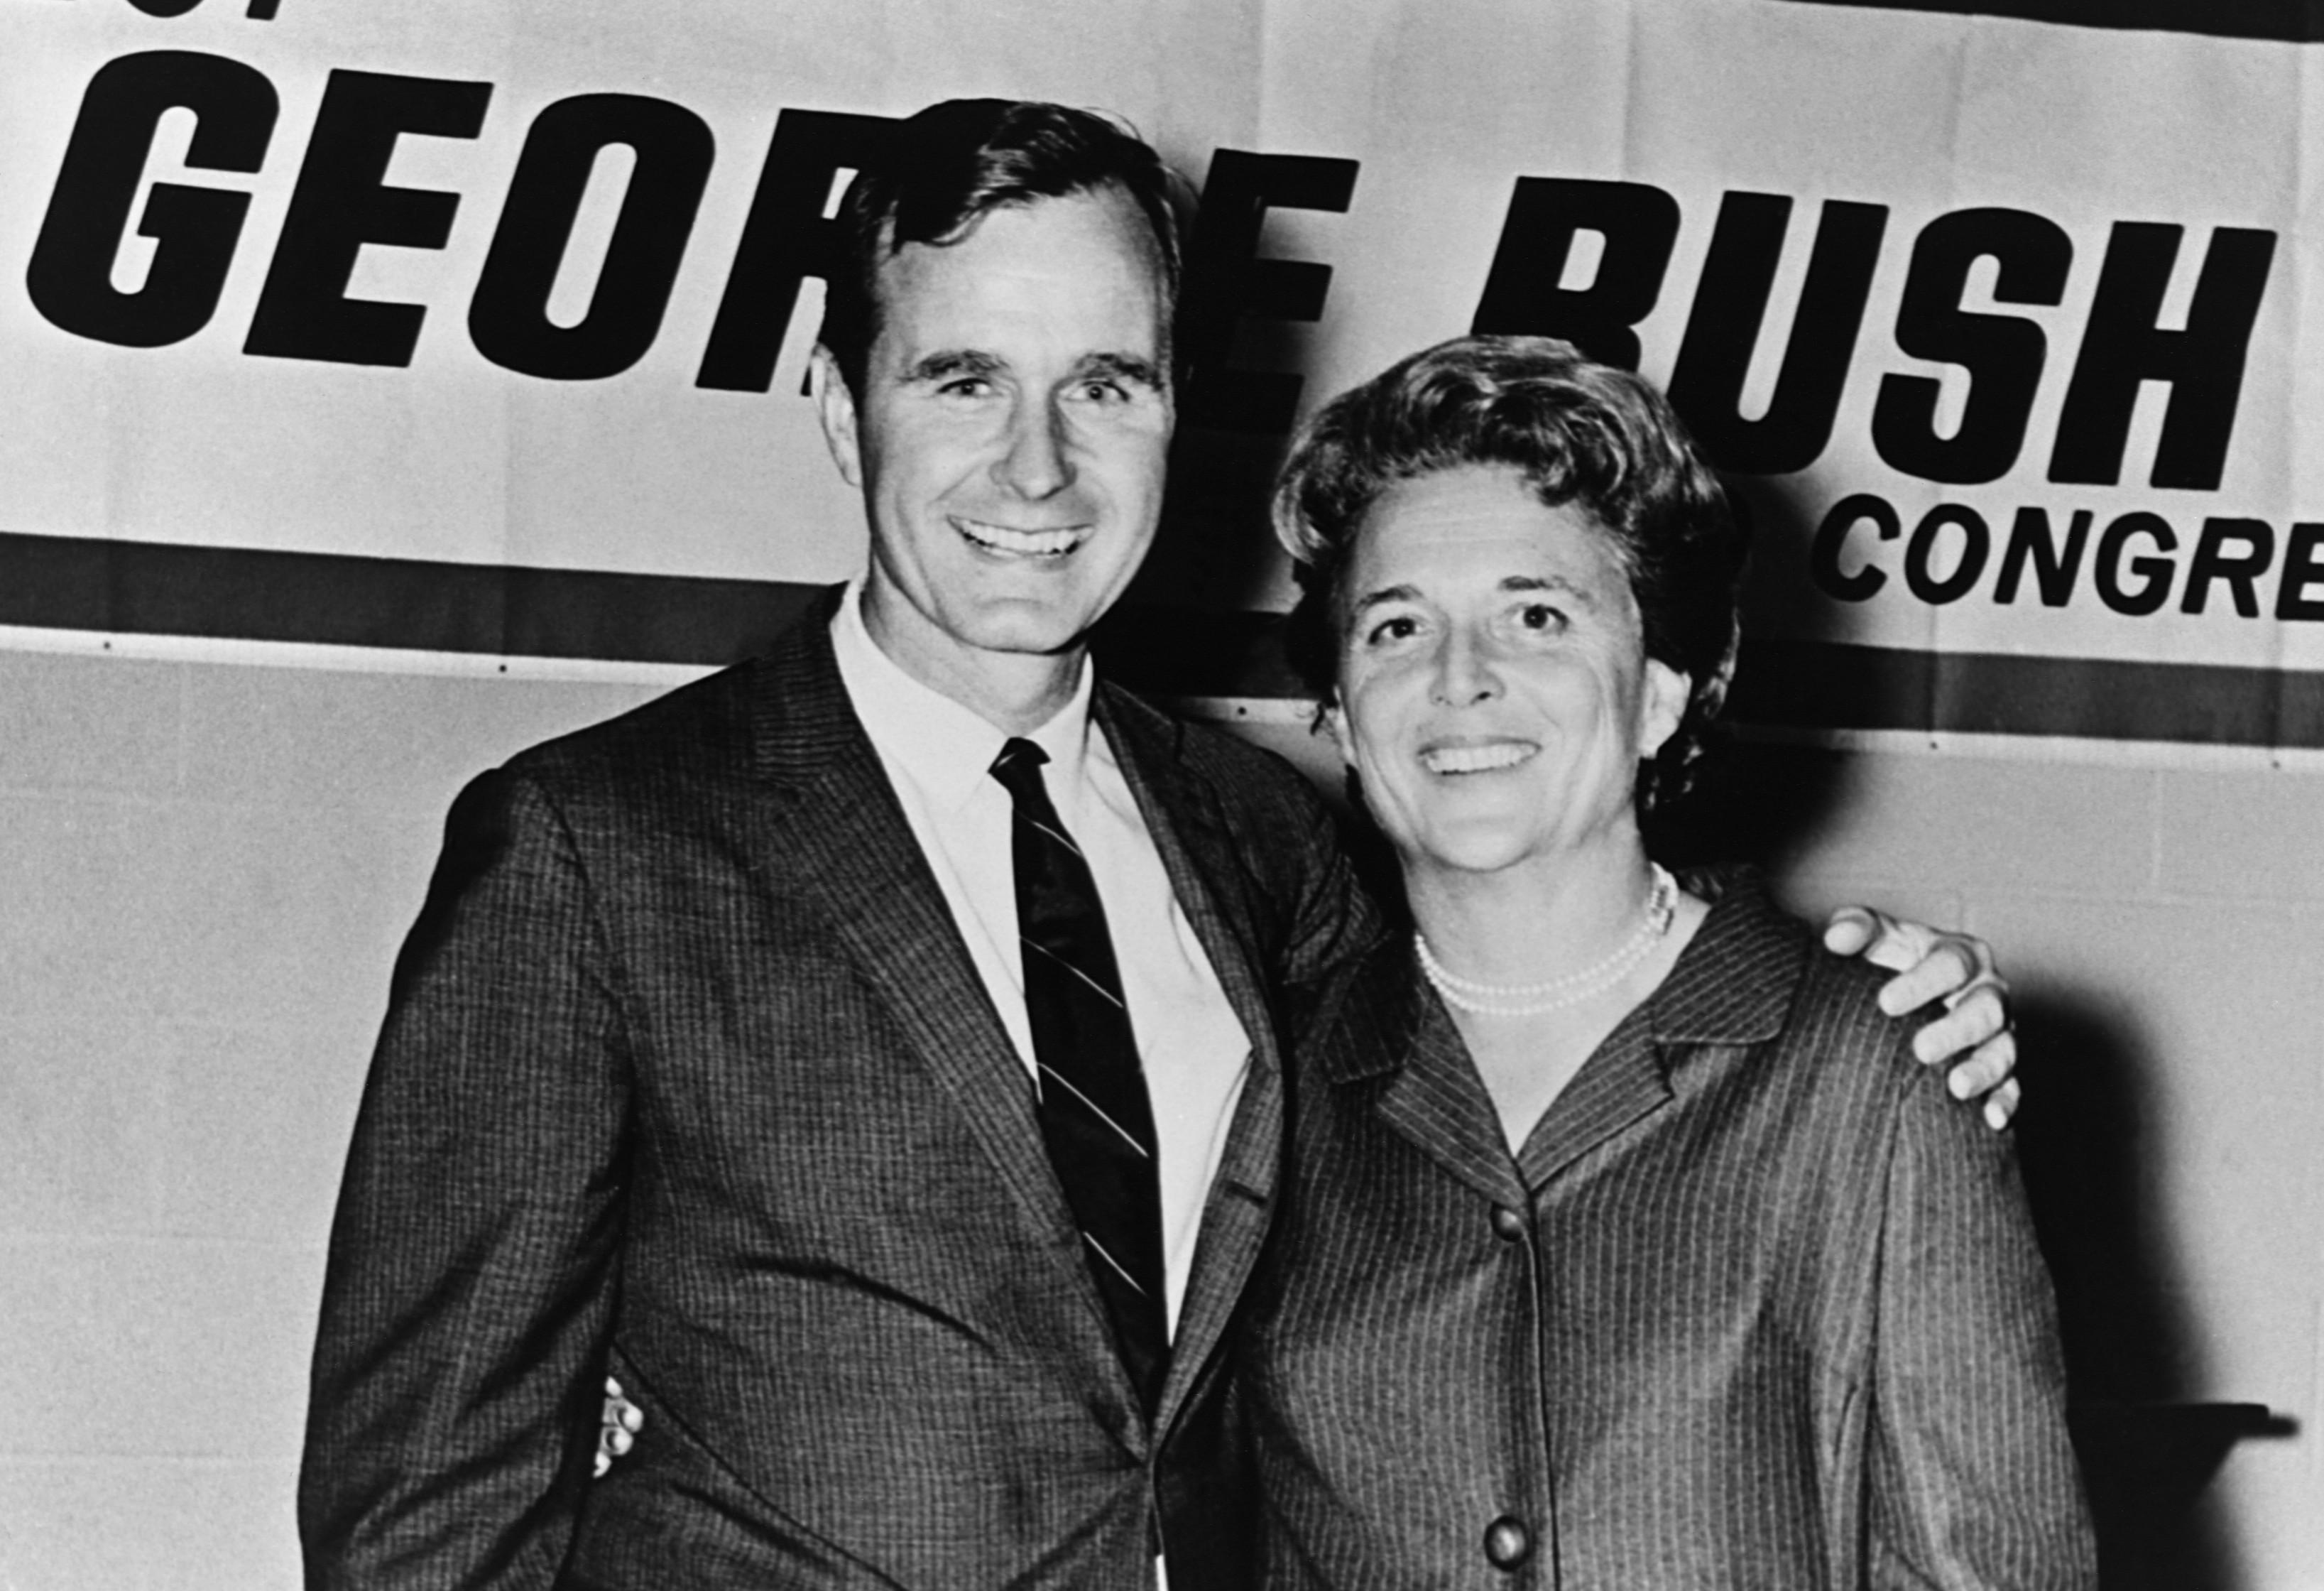 Texas Congressman George Bush Political Career 1966